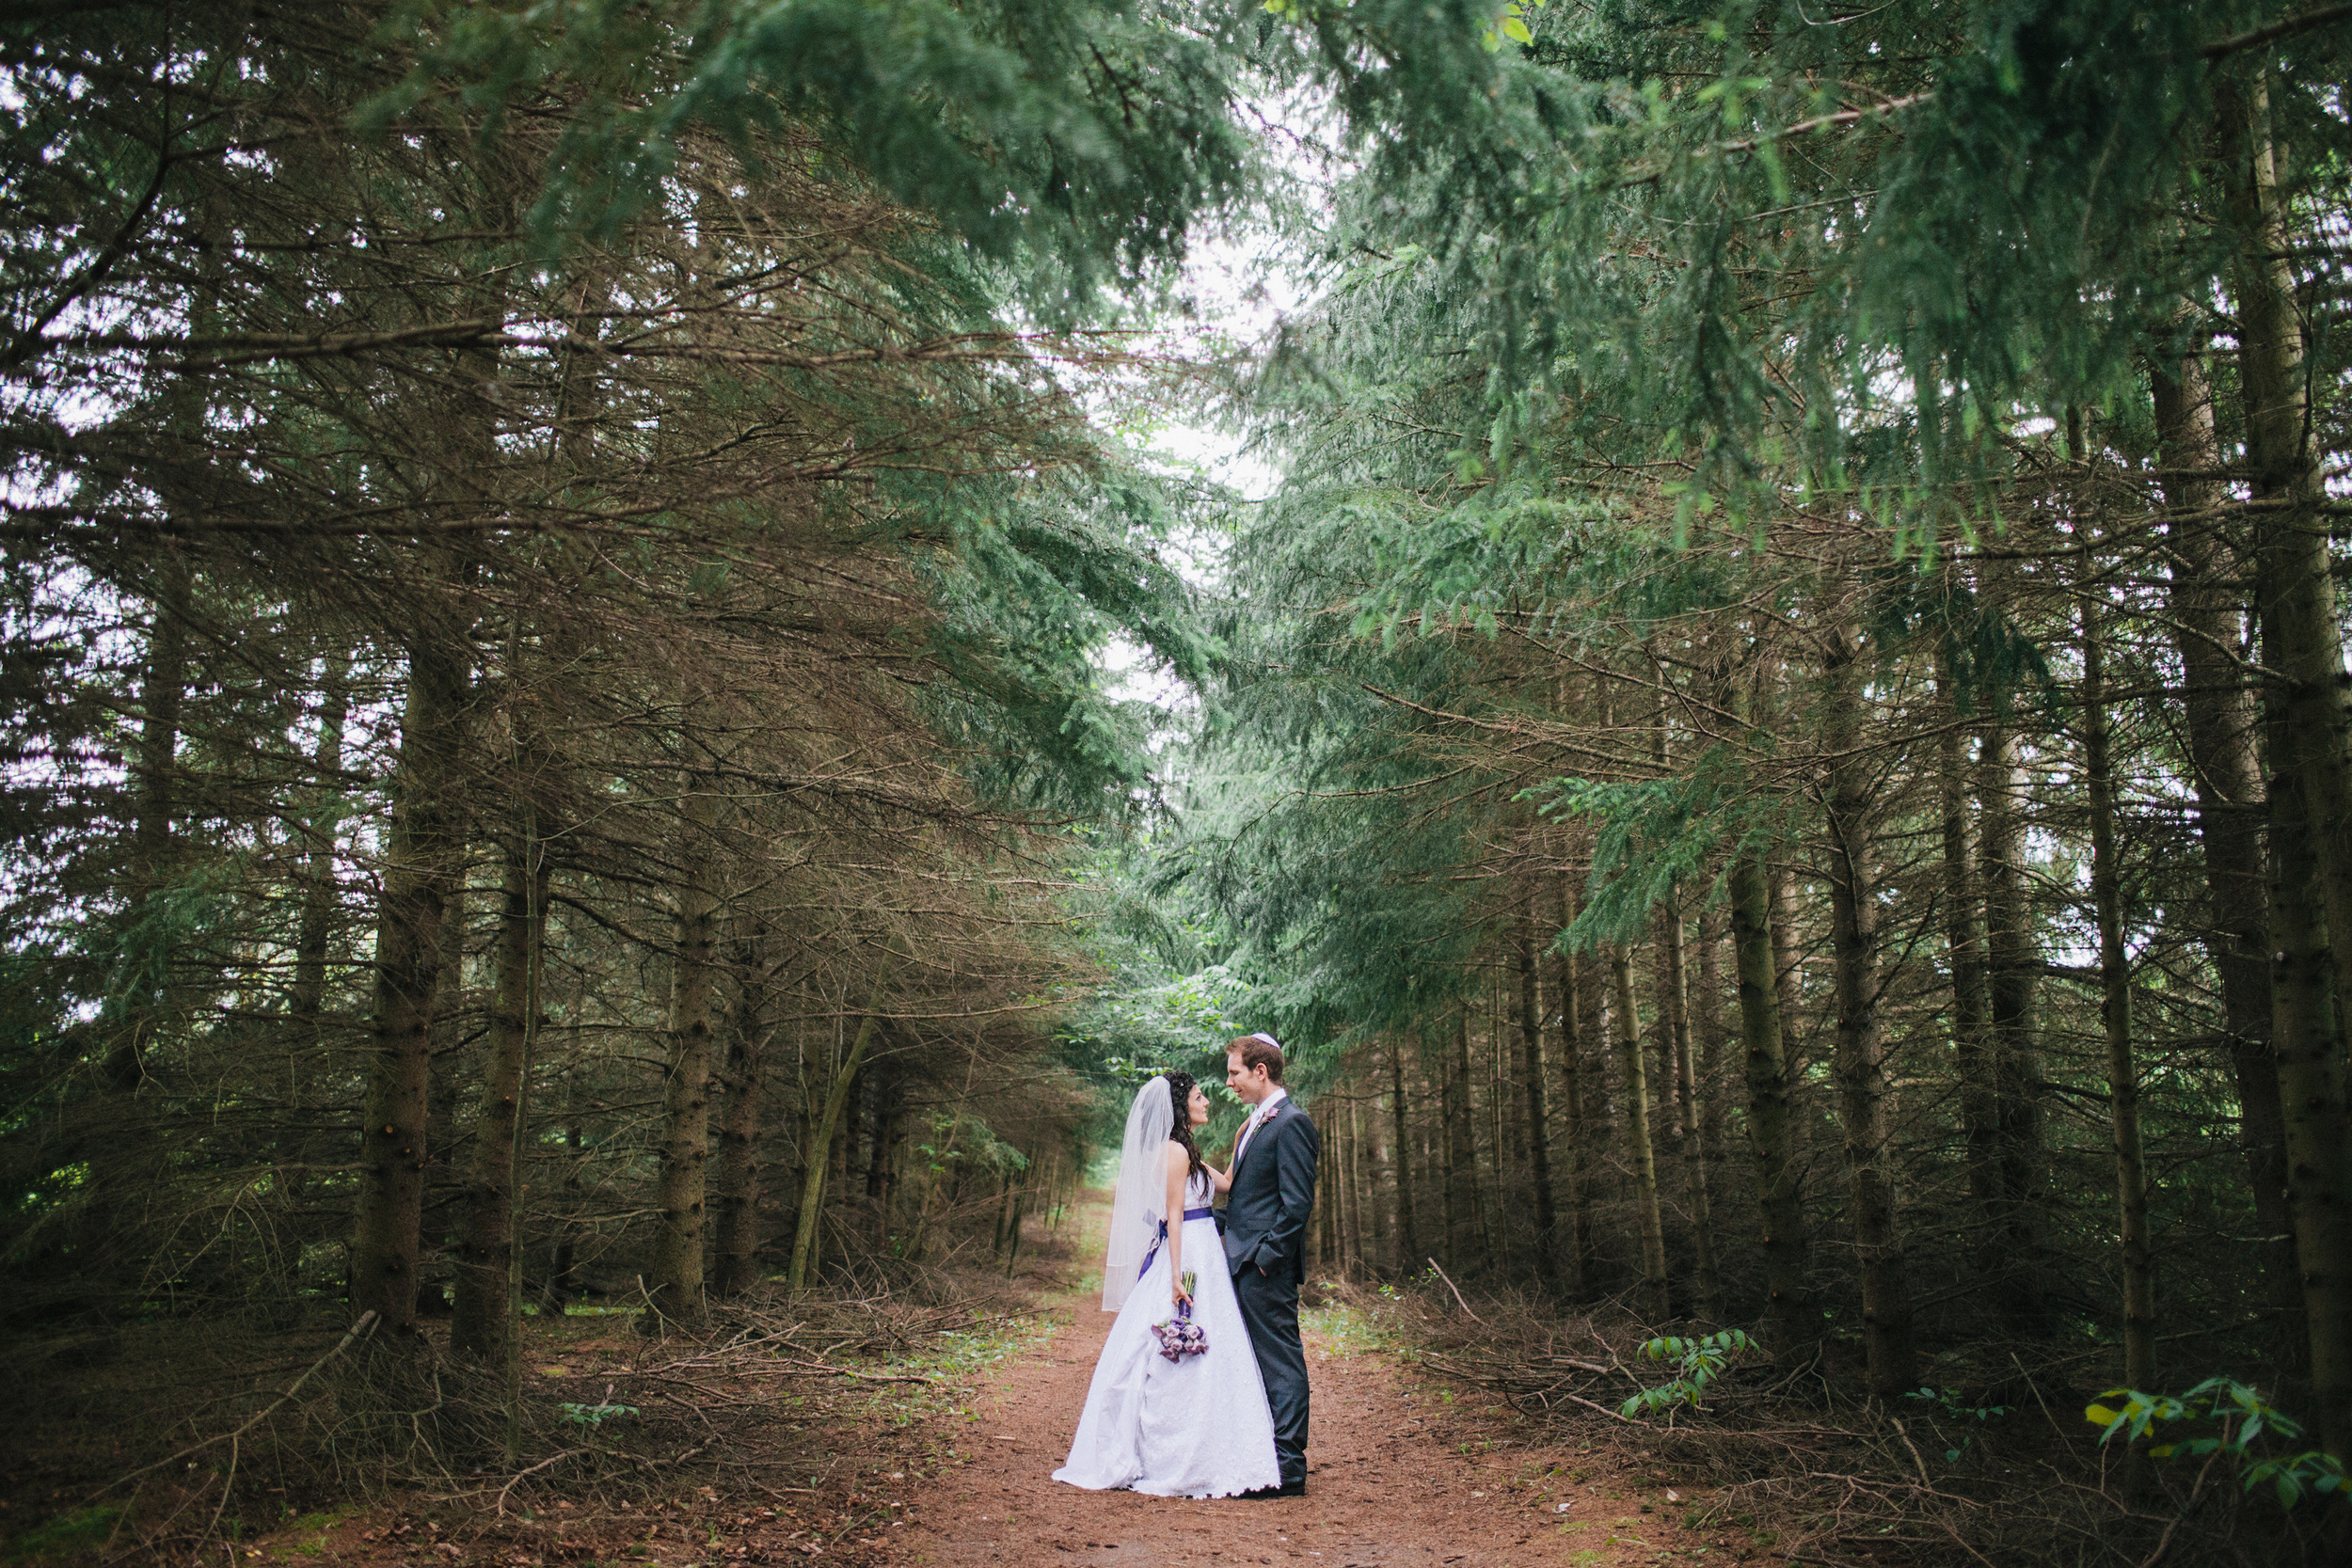 michael-rousseau-photography-kortwright-centre-wedding035.jpg